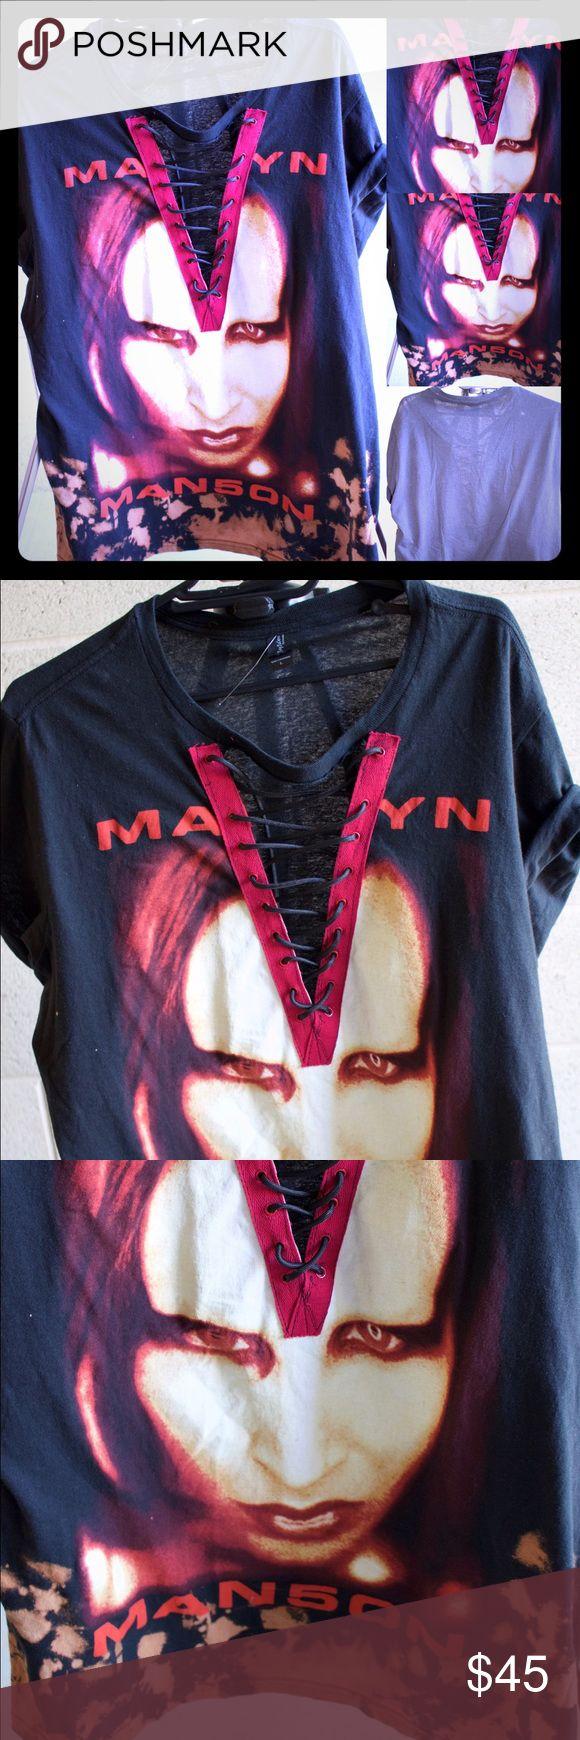 Marilyn Manson rock band lace up Marilyn Manson rock band tee  Tags: Yeezy, yeezus, baby yeezy, baby yeezus, band shirts, yeezy season 3, Fear of God , Kylie lip kit, Guns N' Roses, ,pantera, Slayer, the Beatles , kiss, Rolling Stones, bape, ape, Jordan, supreme, Kylie #fog #madon Tops Tees - Short Sleeve